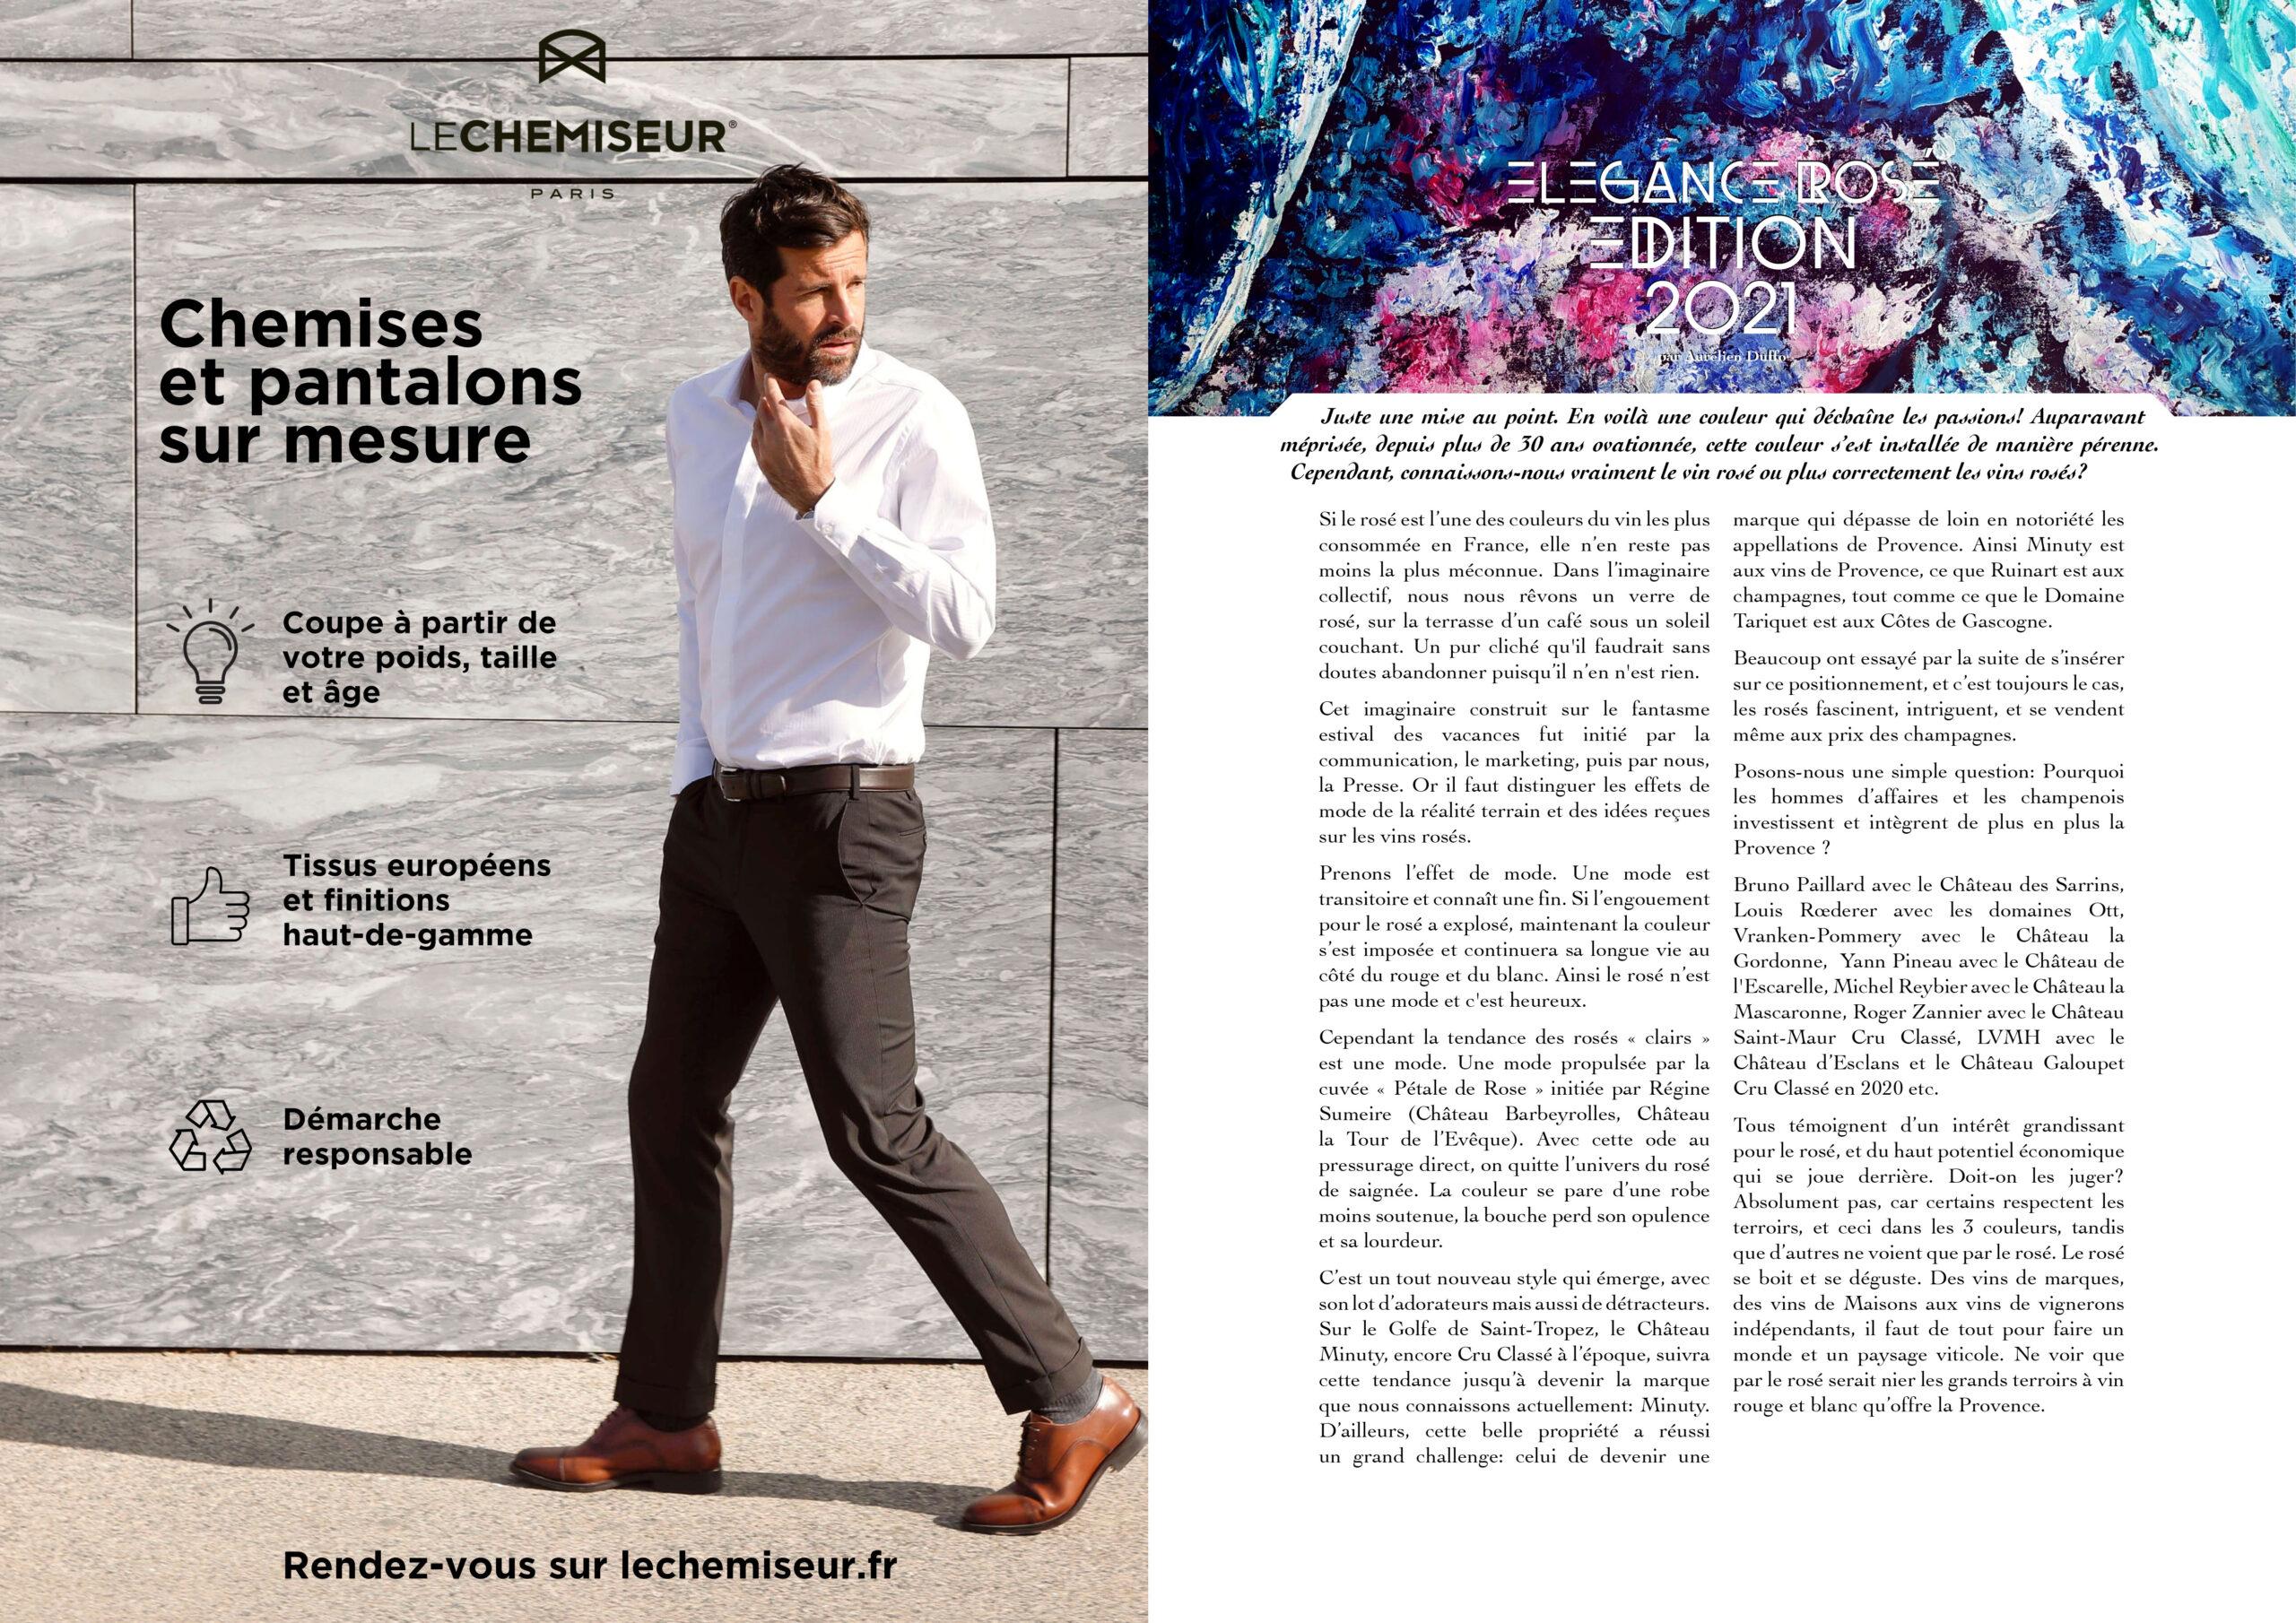 Hautes Exigences Magazine Hors Serie 2021 page 48-49